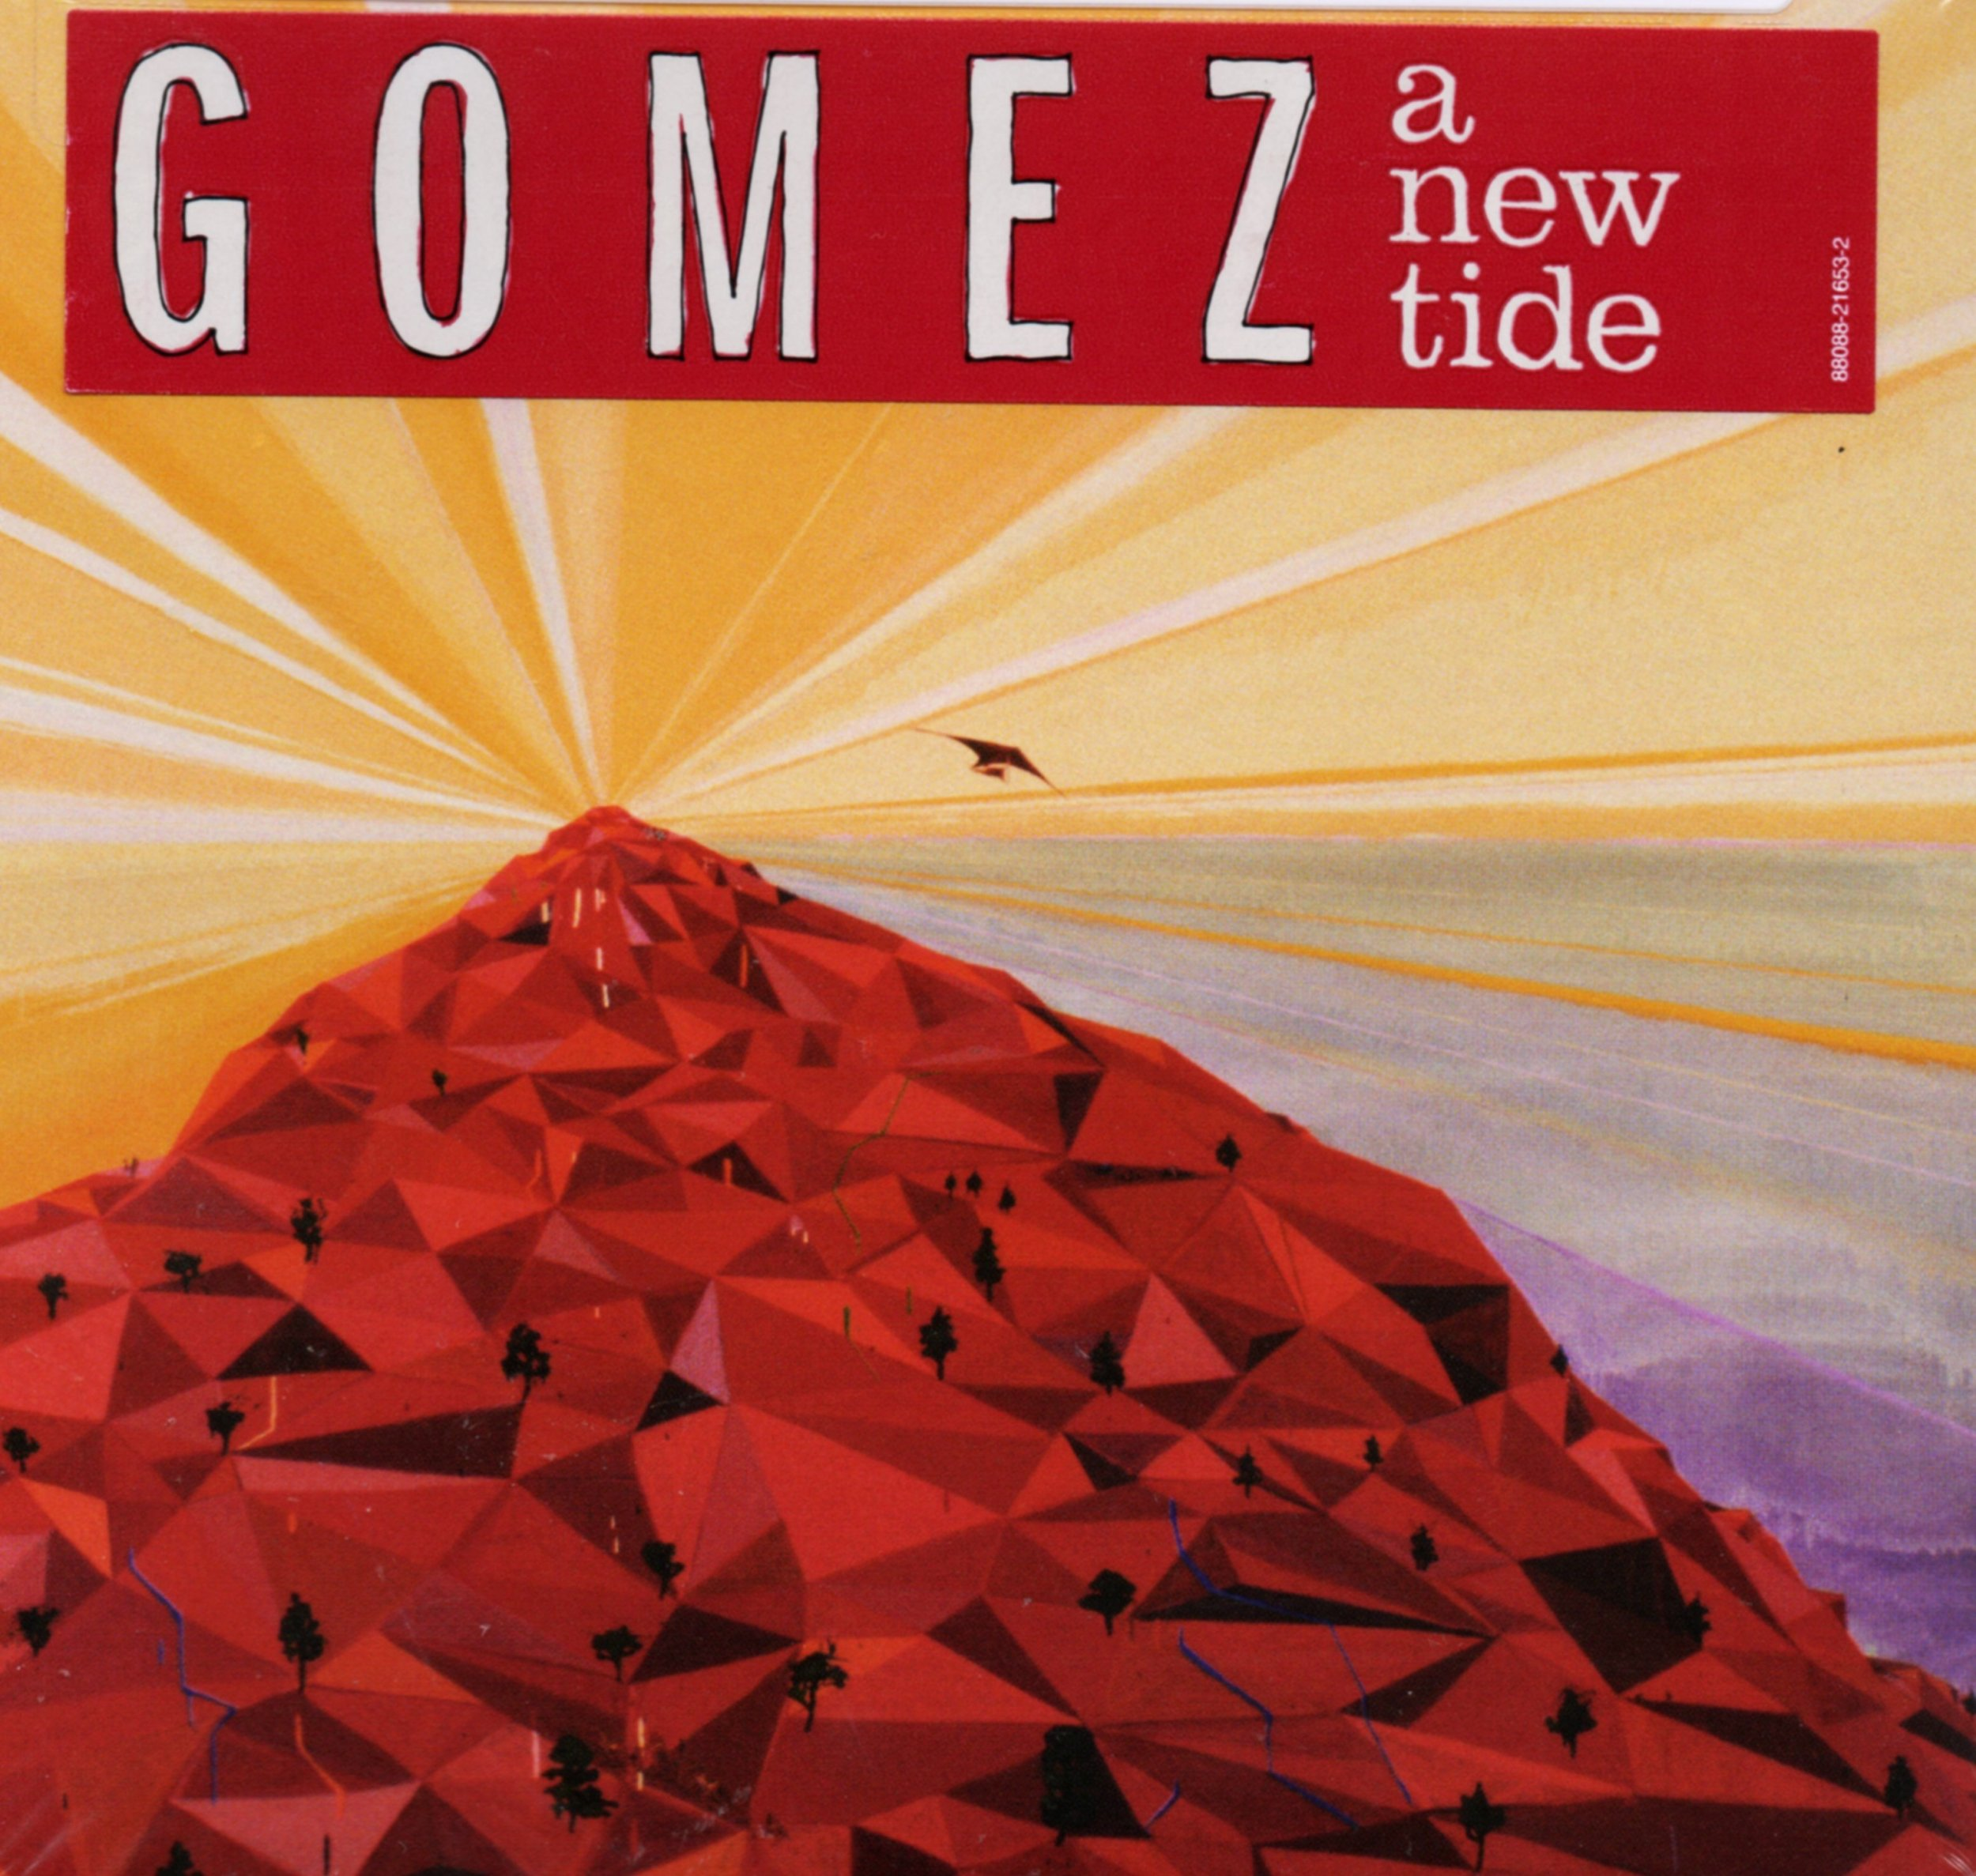 New Tide